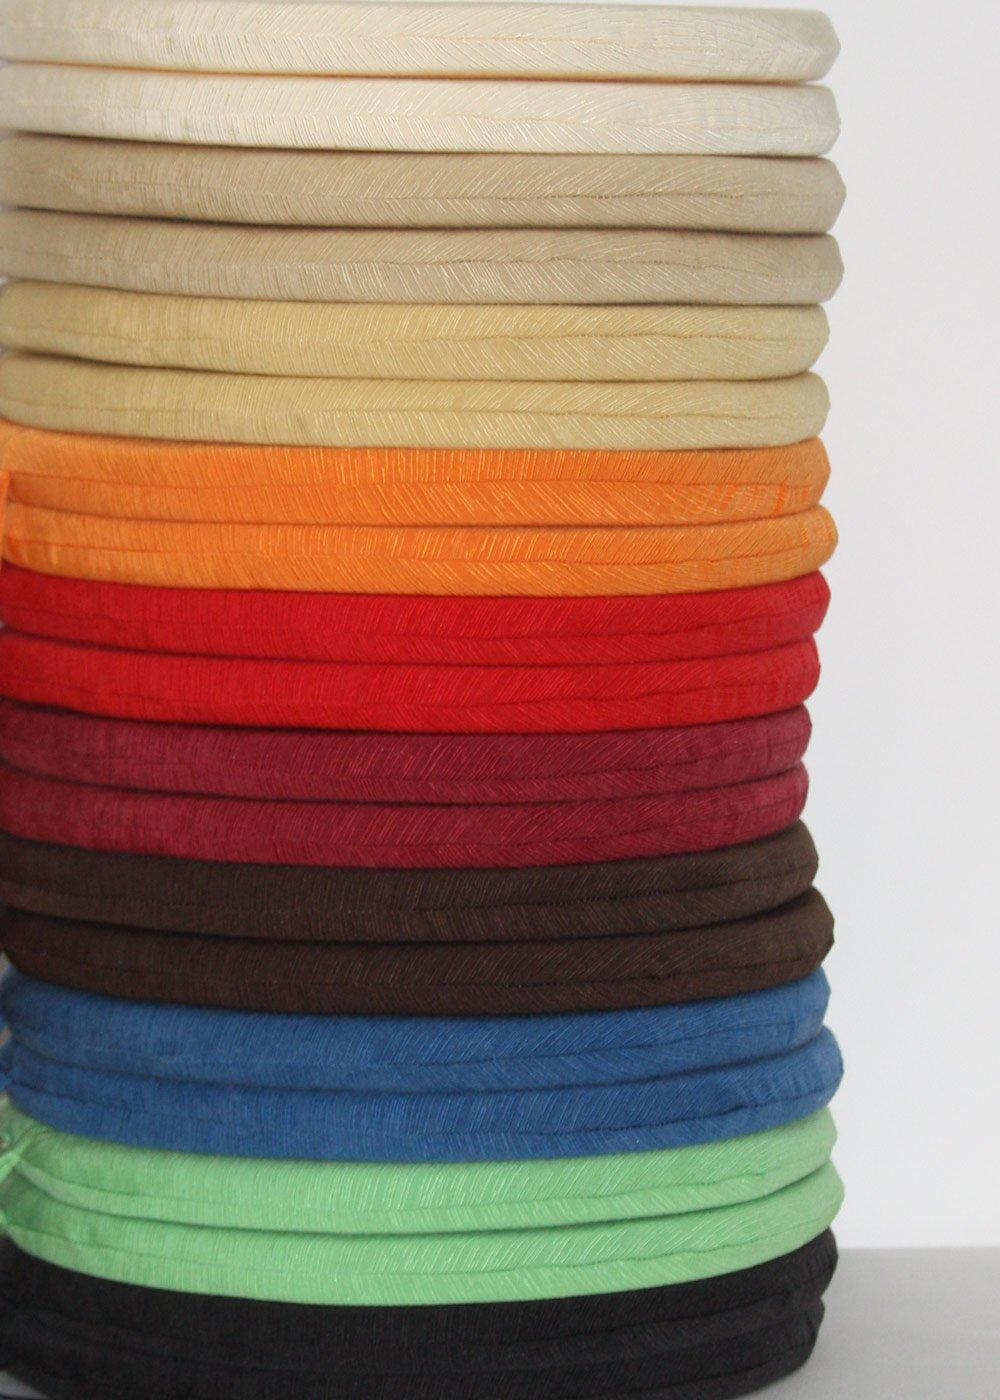 4 cojines de silla redondos, 50% algodón - x 50% poliéster. , naranja, 40 x - 40 115c46